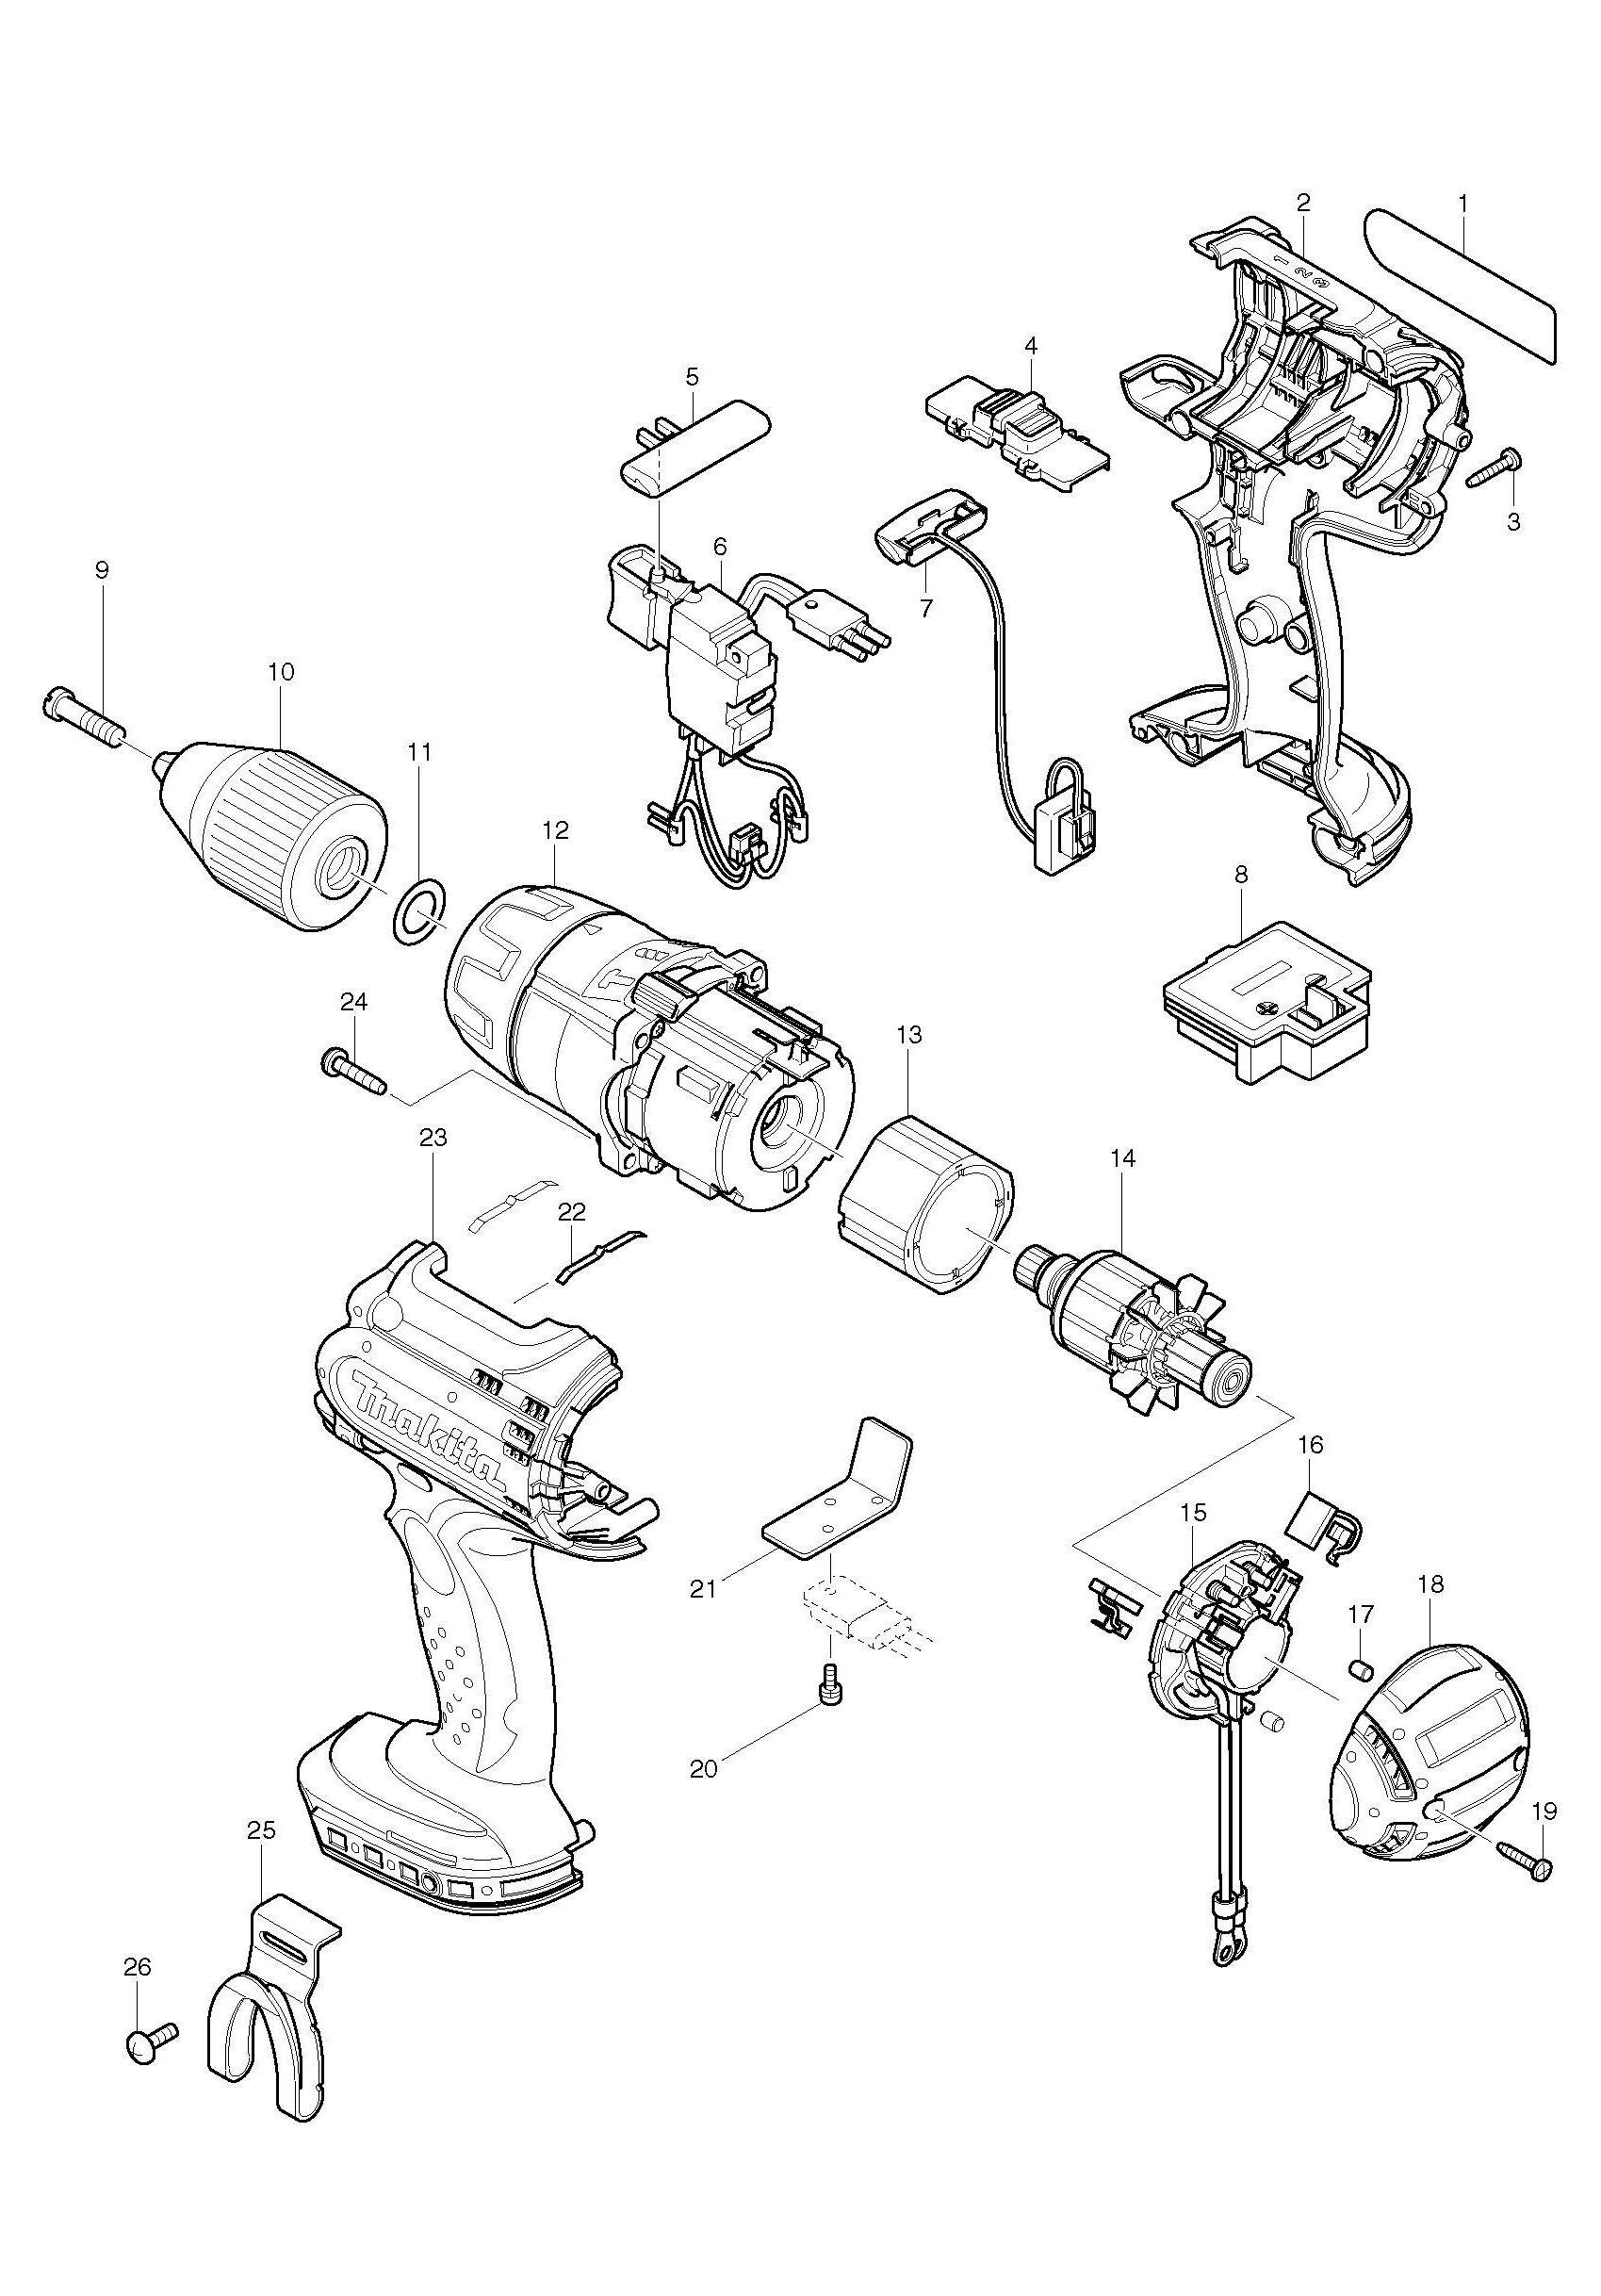 Karcher Switch Wiring Diagram